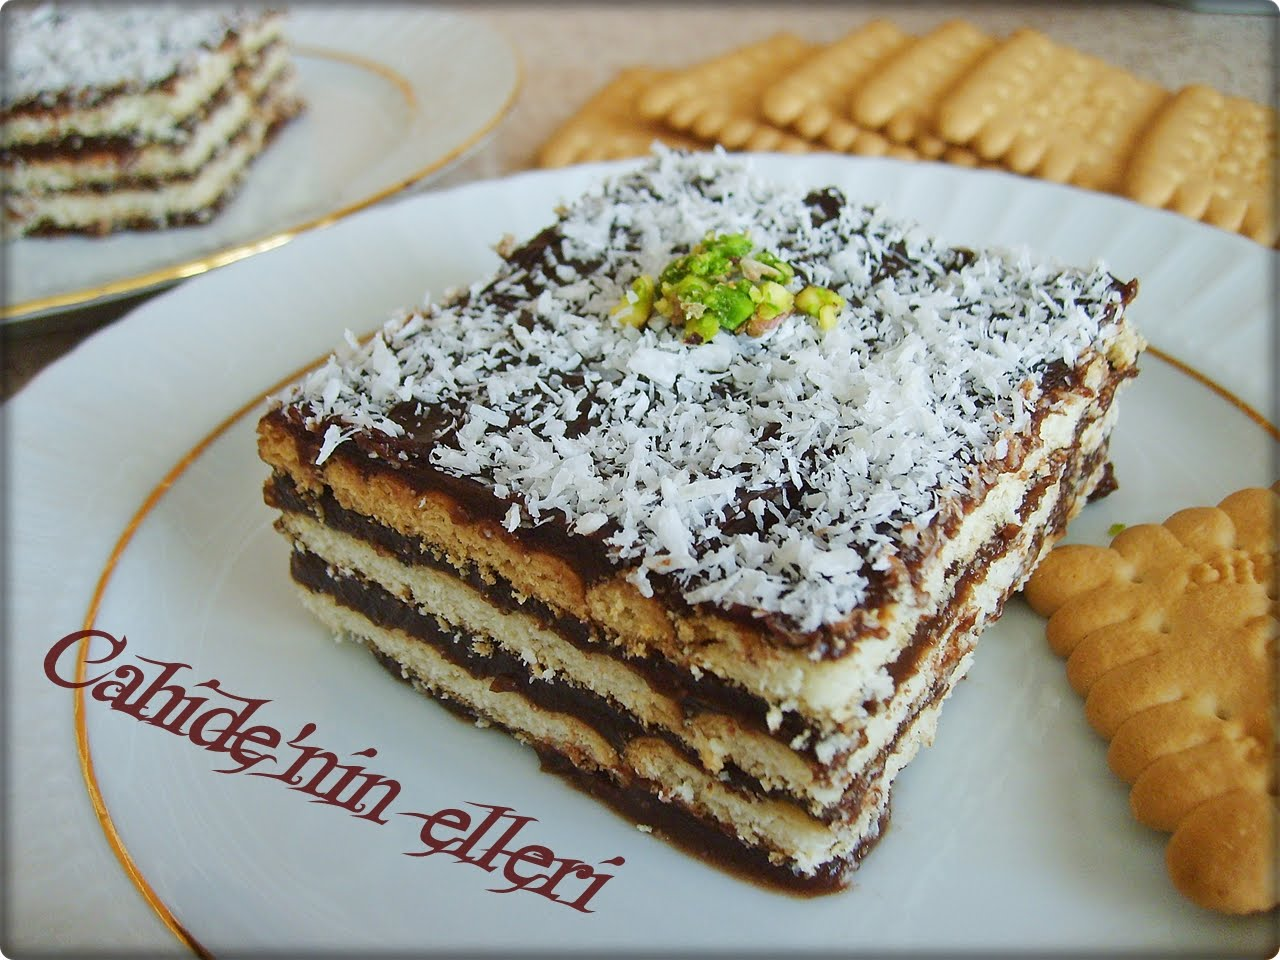 Related to Çikolatalı Toplar Tarifi Kolay Pasta Tarifleri - Resimli